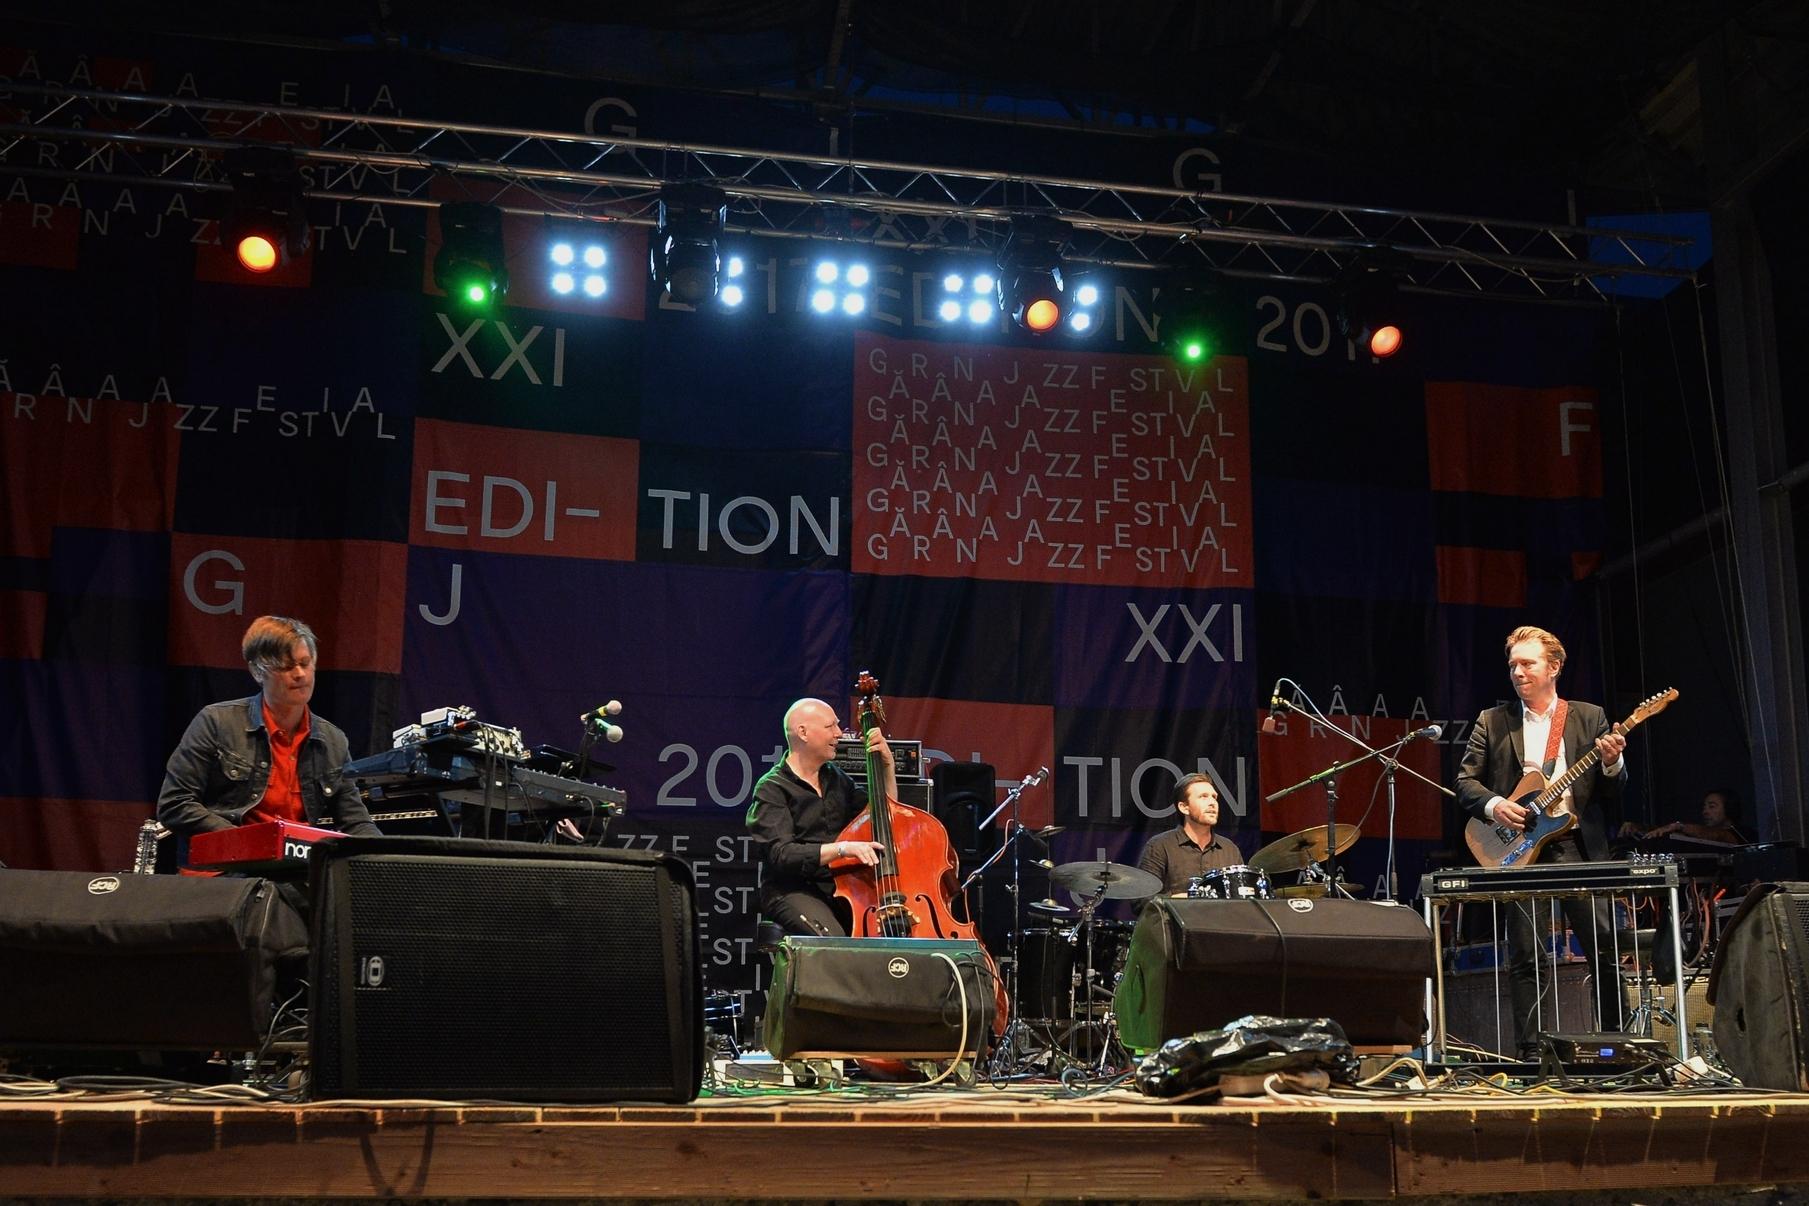 Tonbruket at Garana Jazz Festival 2017